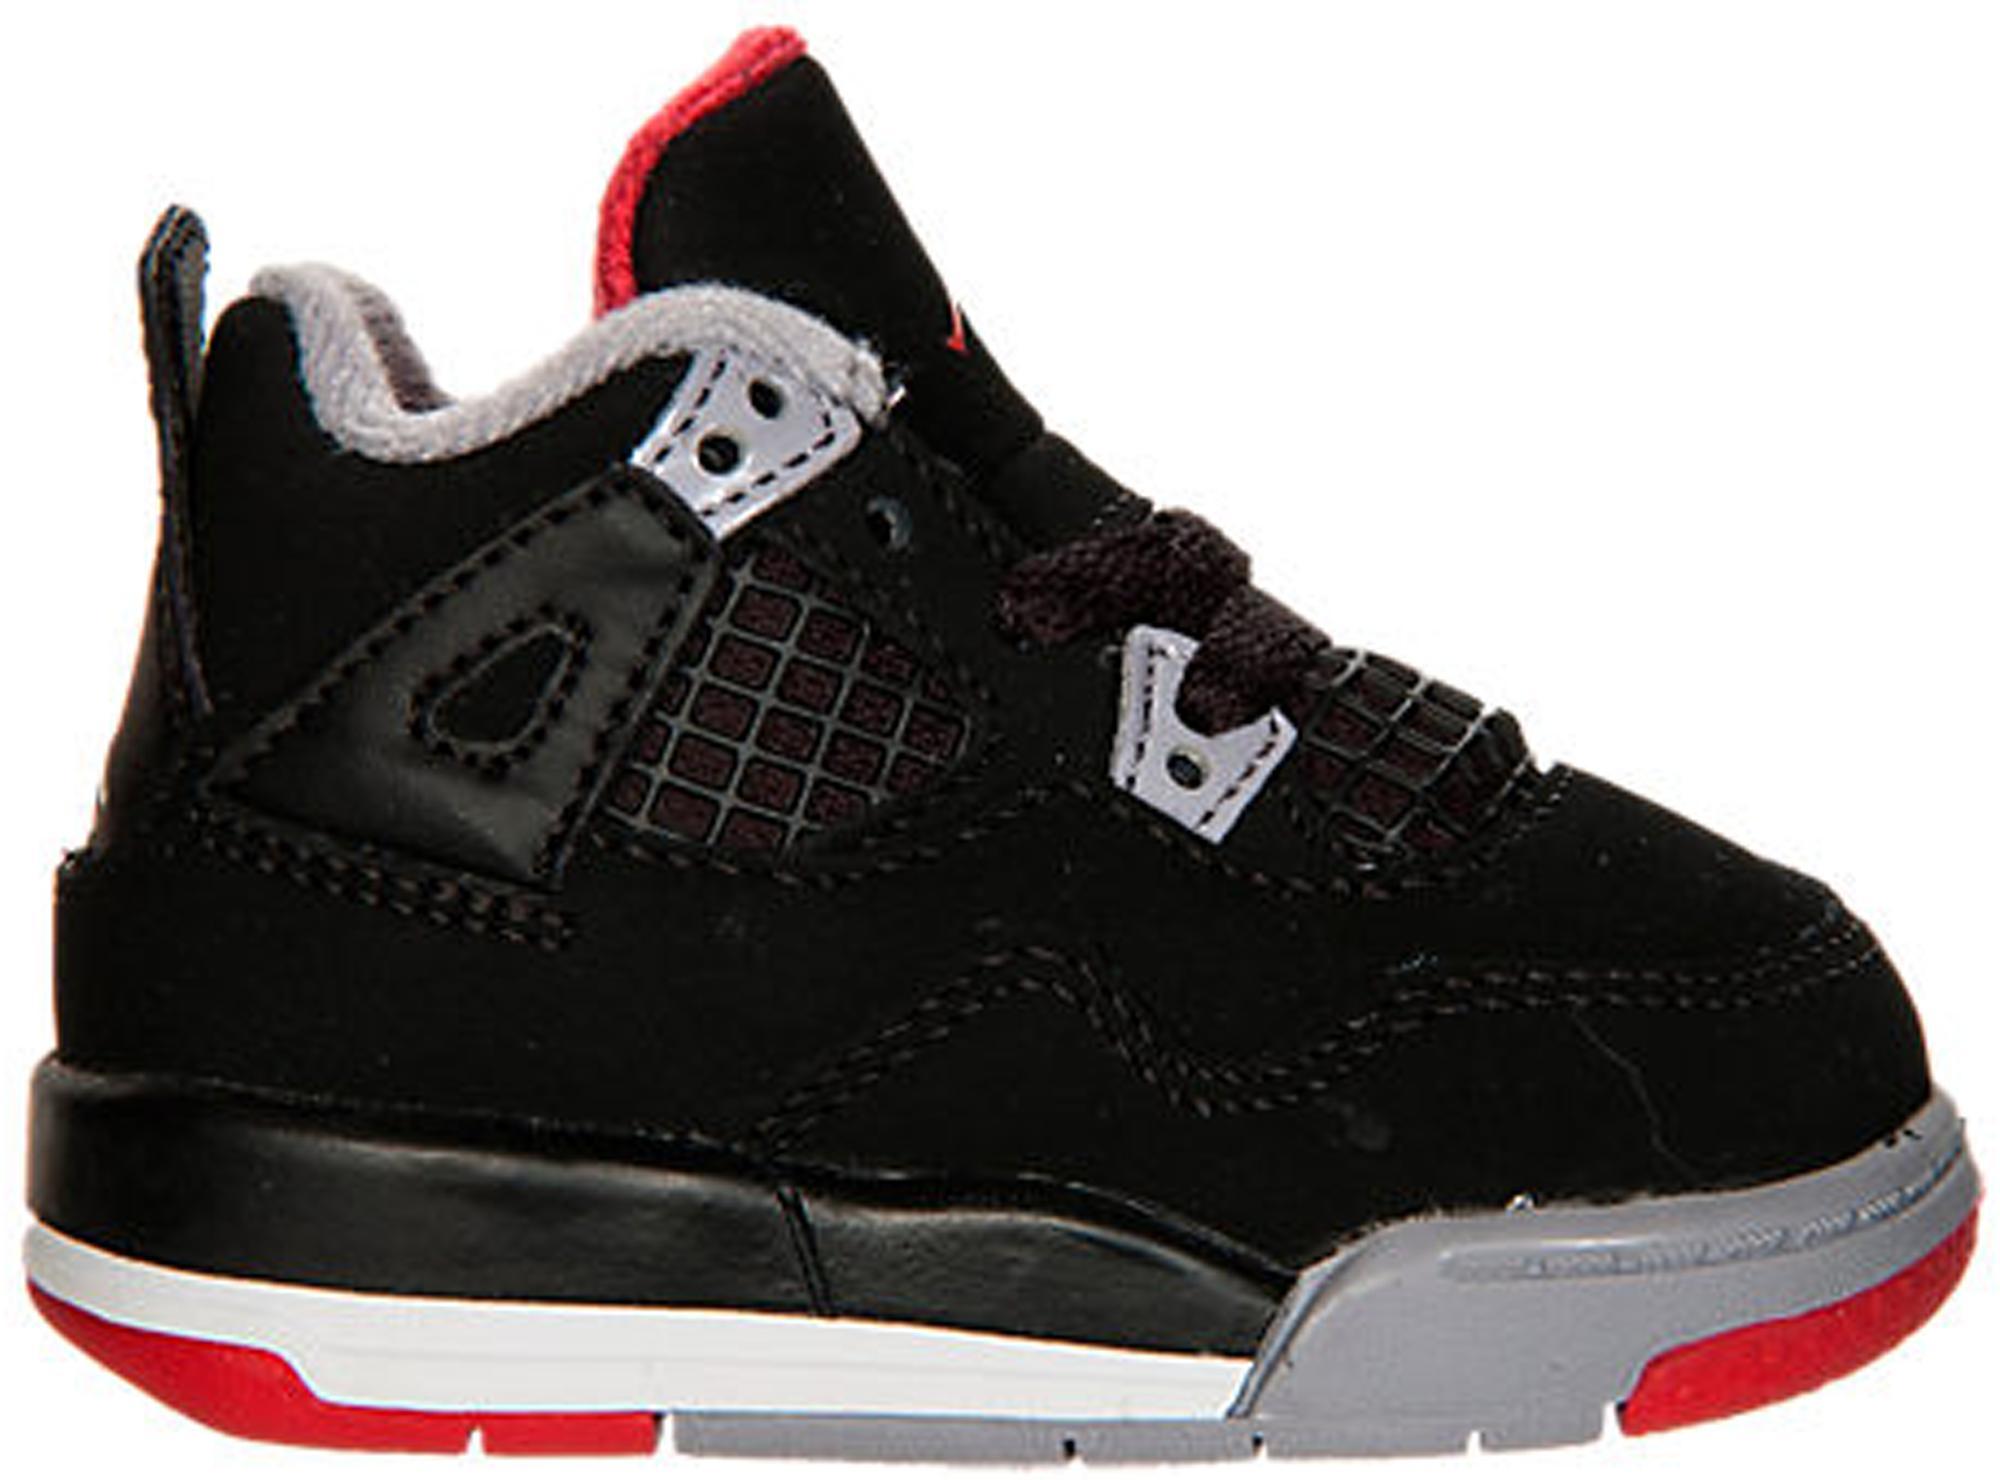 55a8e97d066 Lyst - Nike 4 Retro Black Cement 2012 (td) in Black for Men